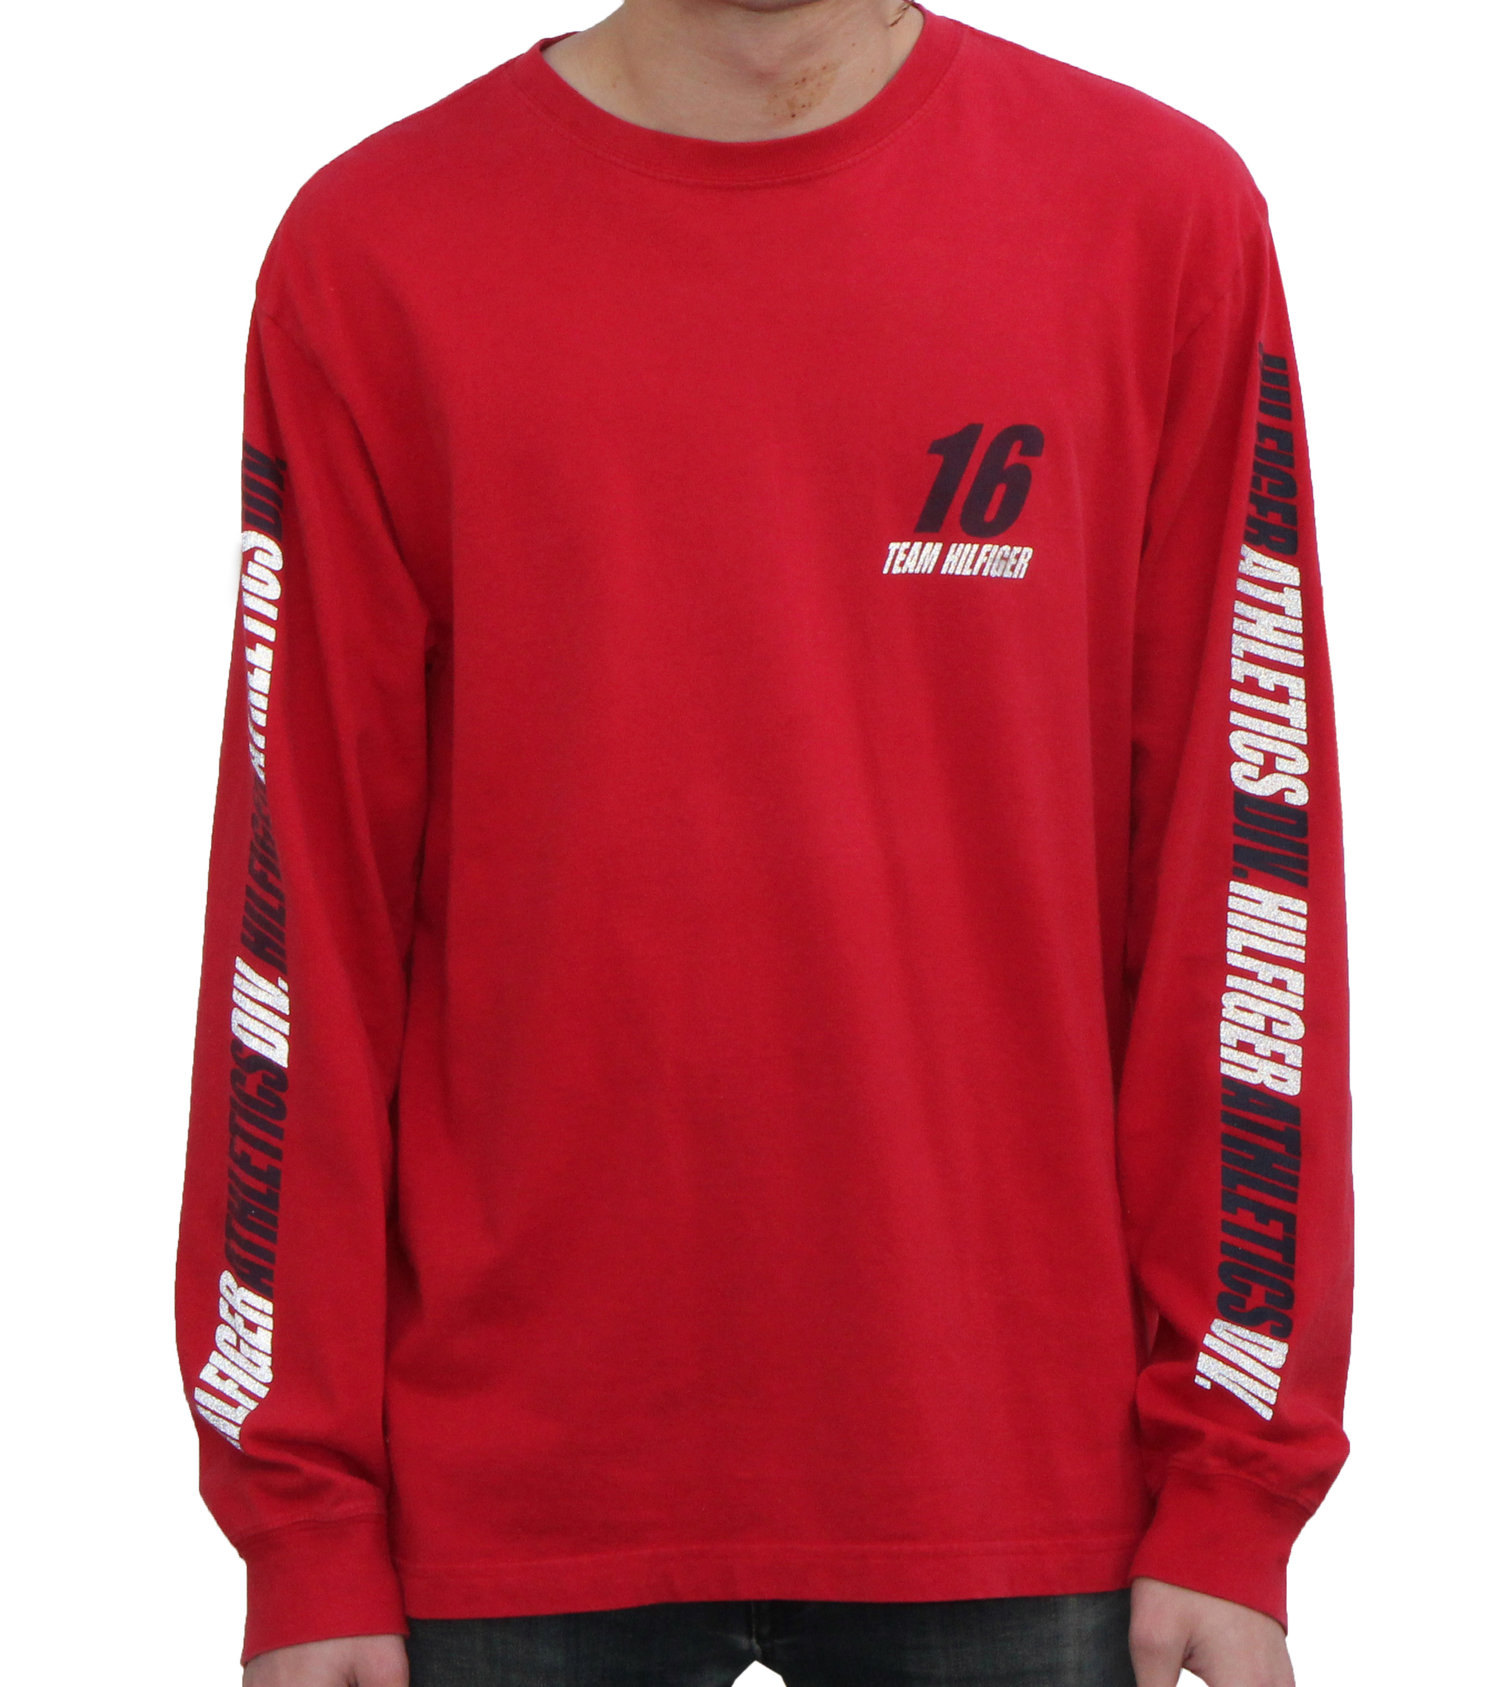 8e929c54 Vintage Tommy Hilfiger Athletics Div Red / Black / 3M Long Sleeve Shirt  (Size M) — Roots